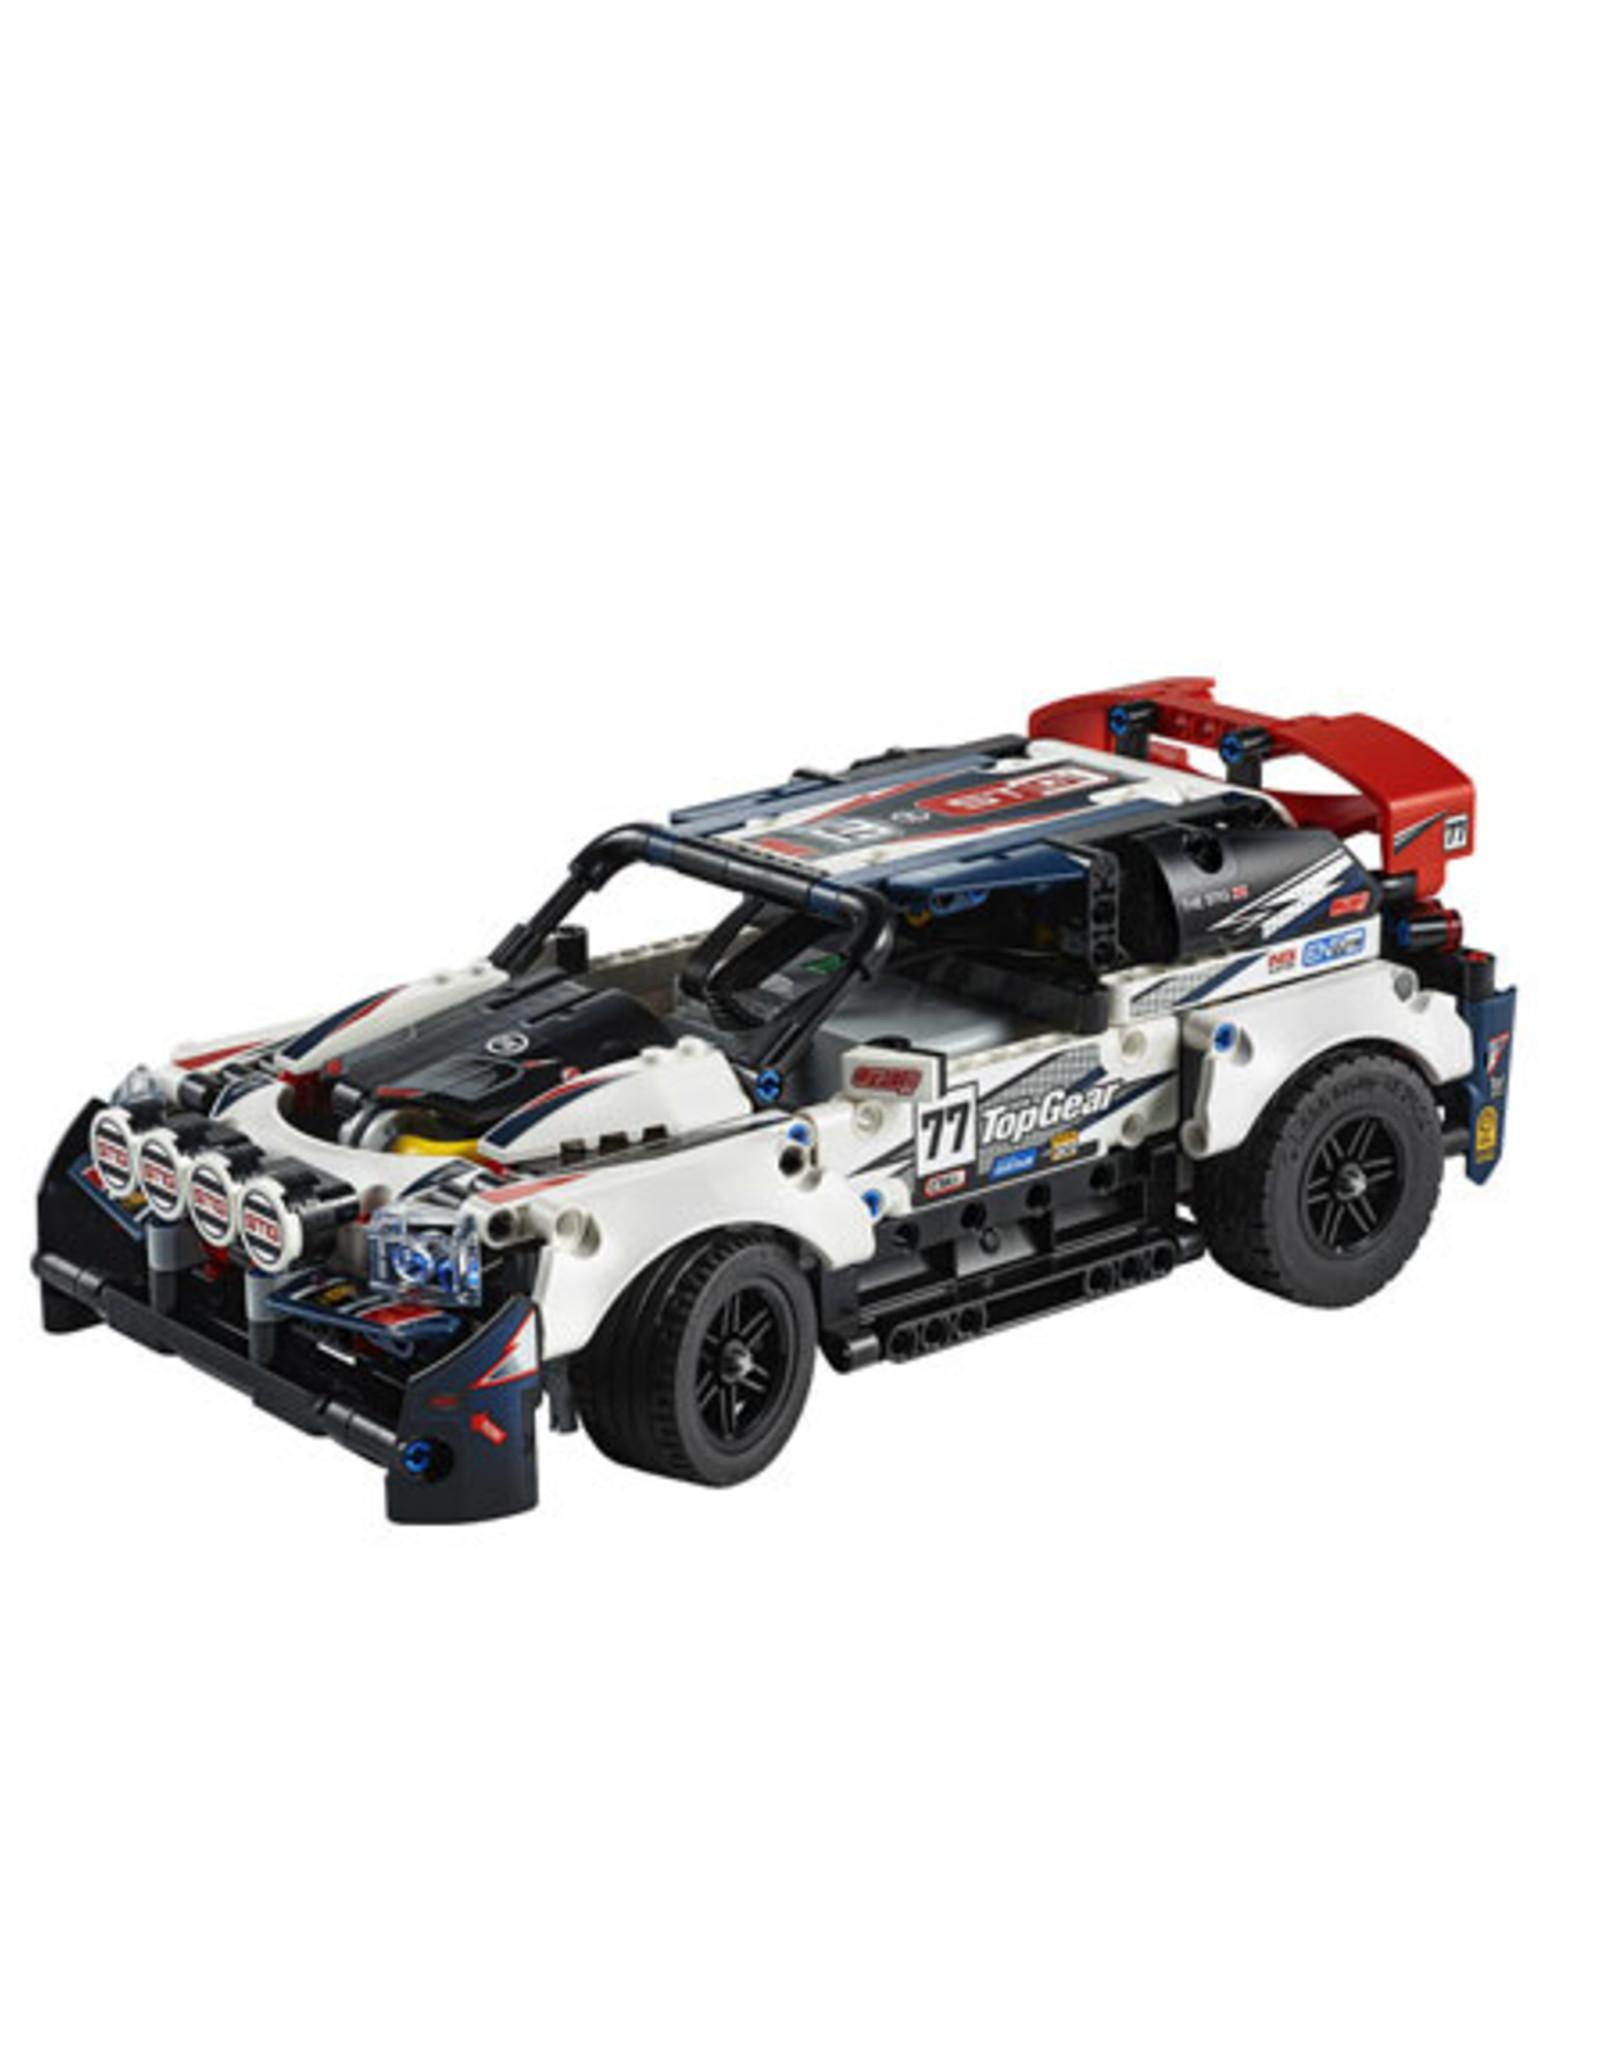 LEGO LEGO 42109 Top Gear - Rally Car TECHNIC